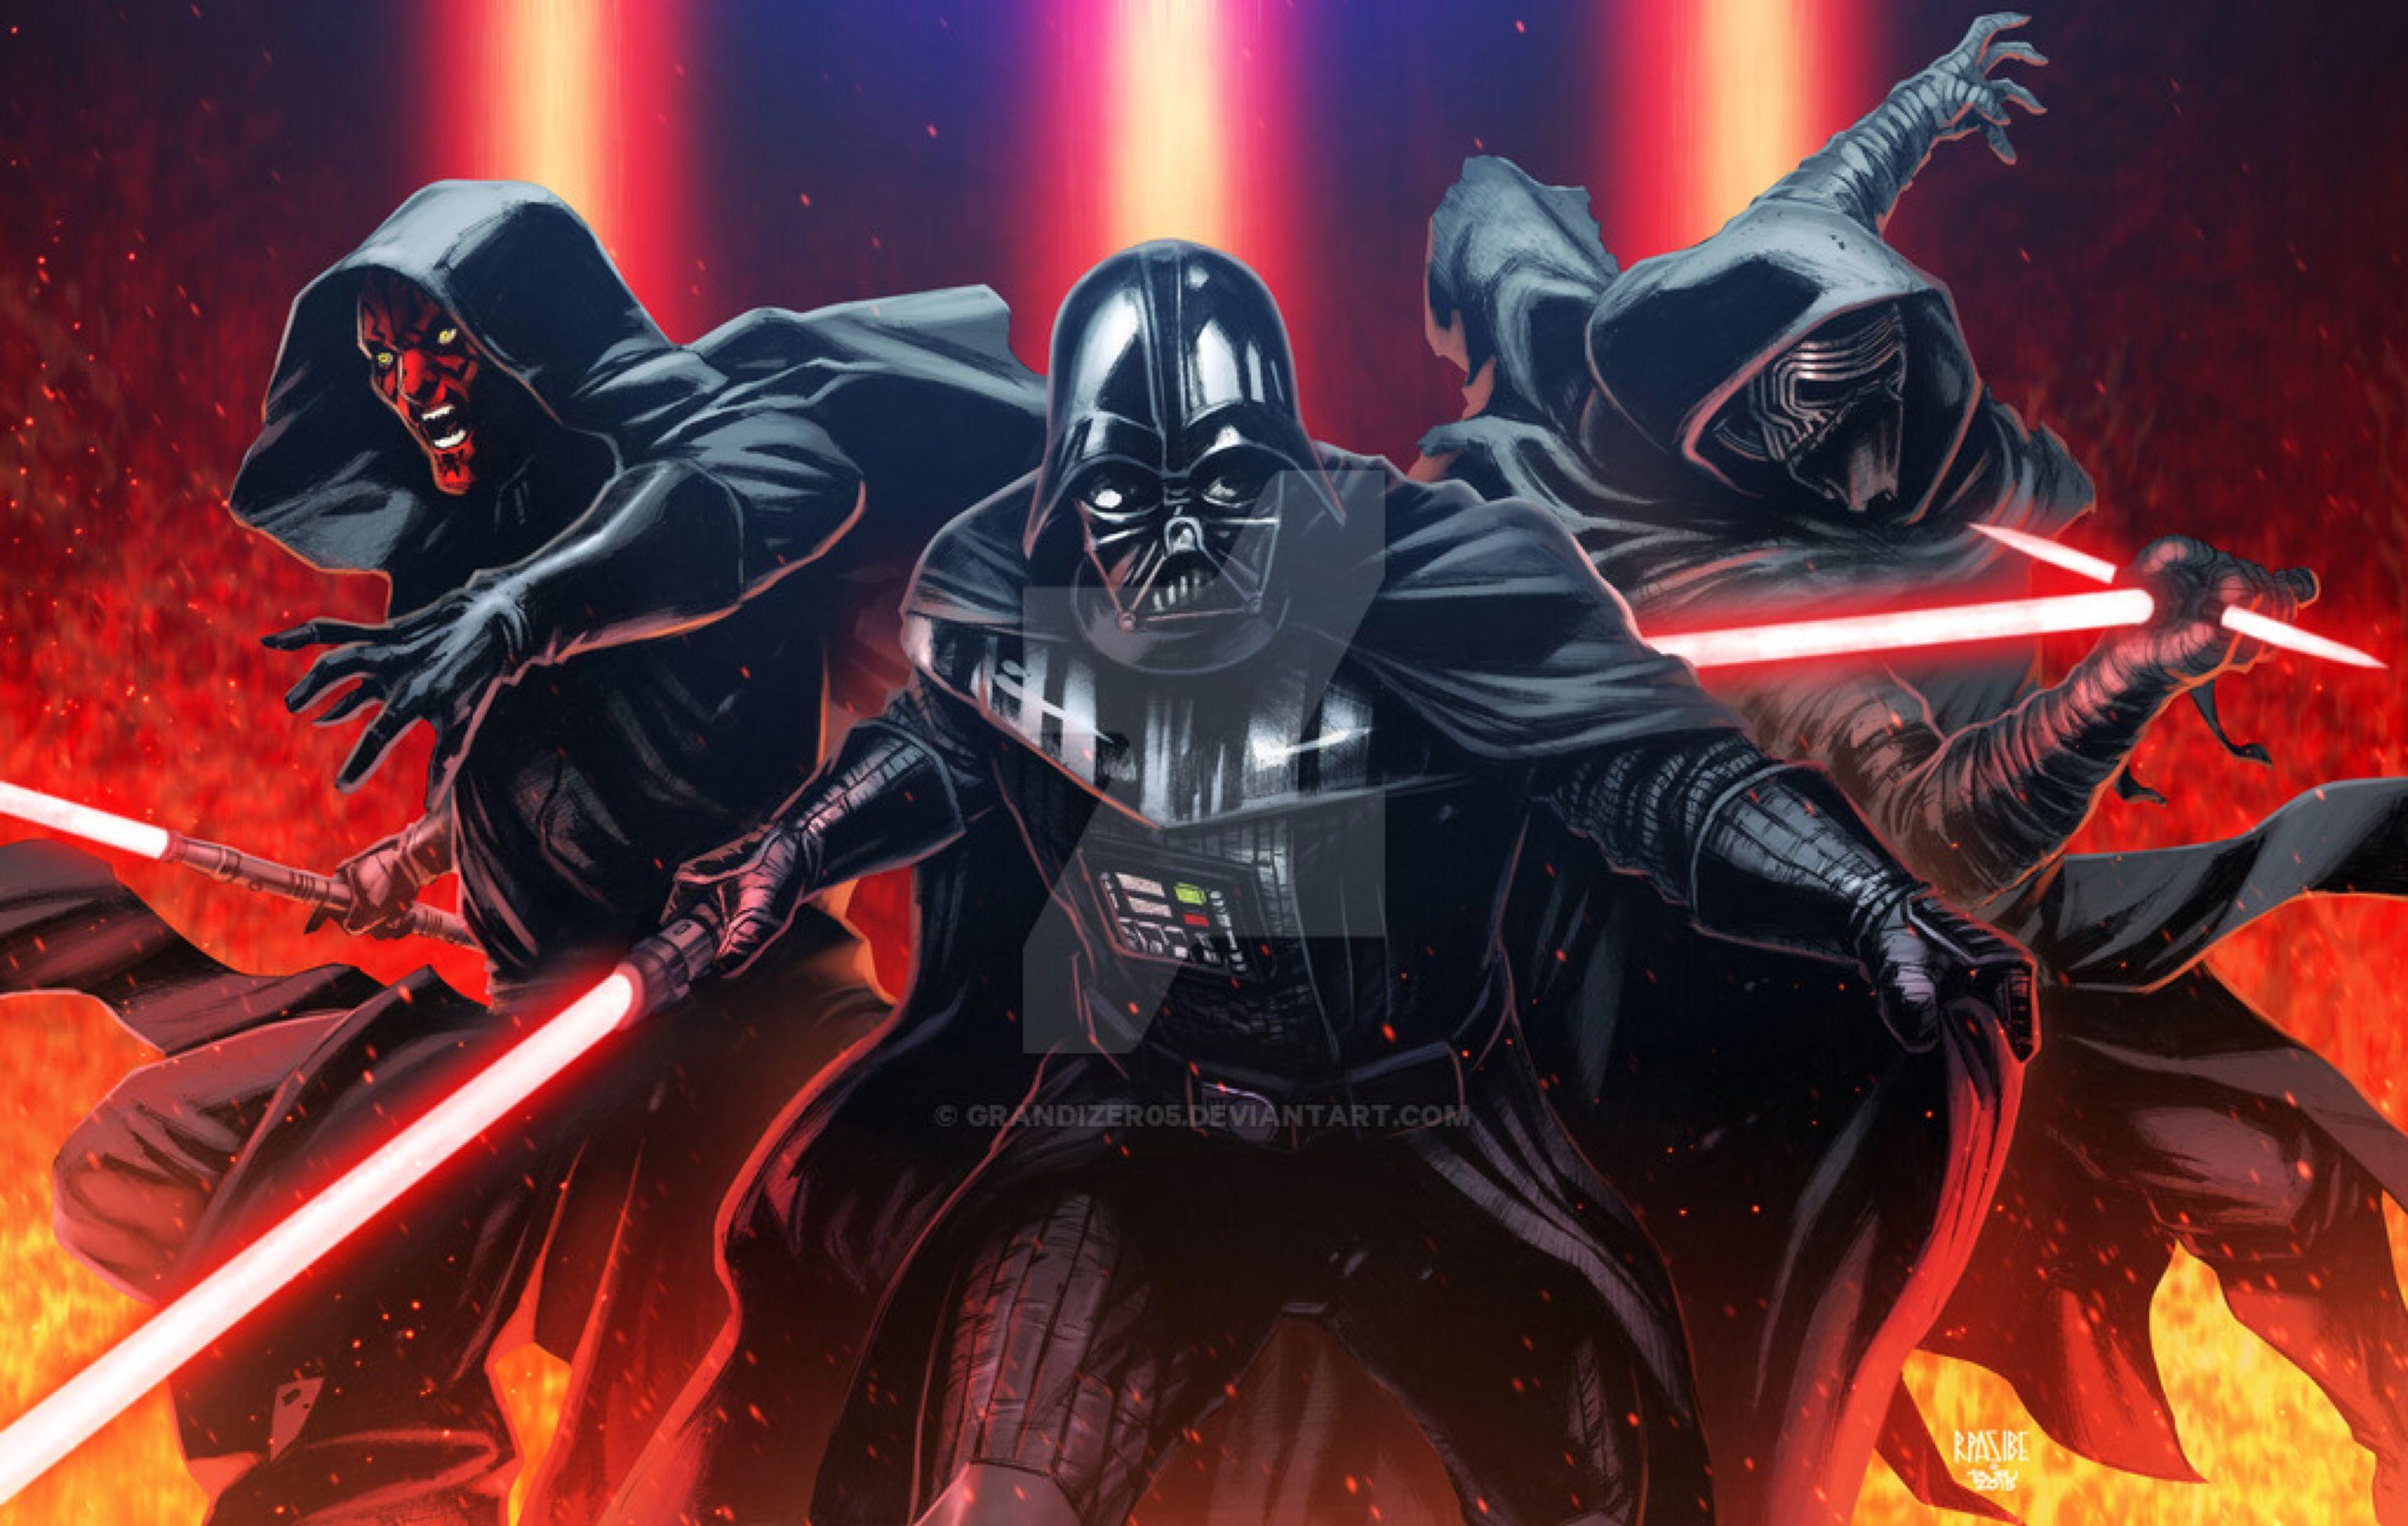 Sith Lords Colored Star Wars Wallpaper Star Wars Art Star Wars Kylo Ren